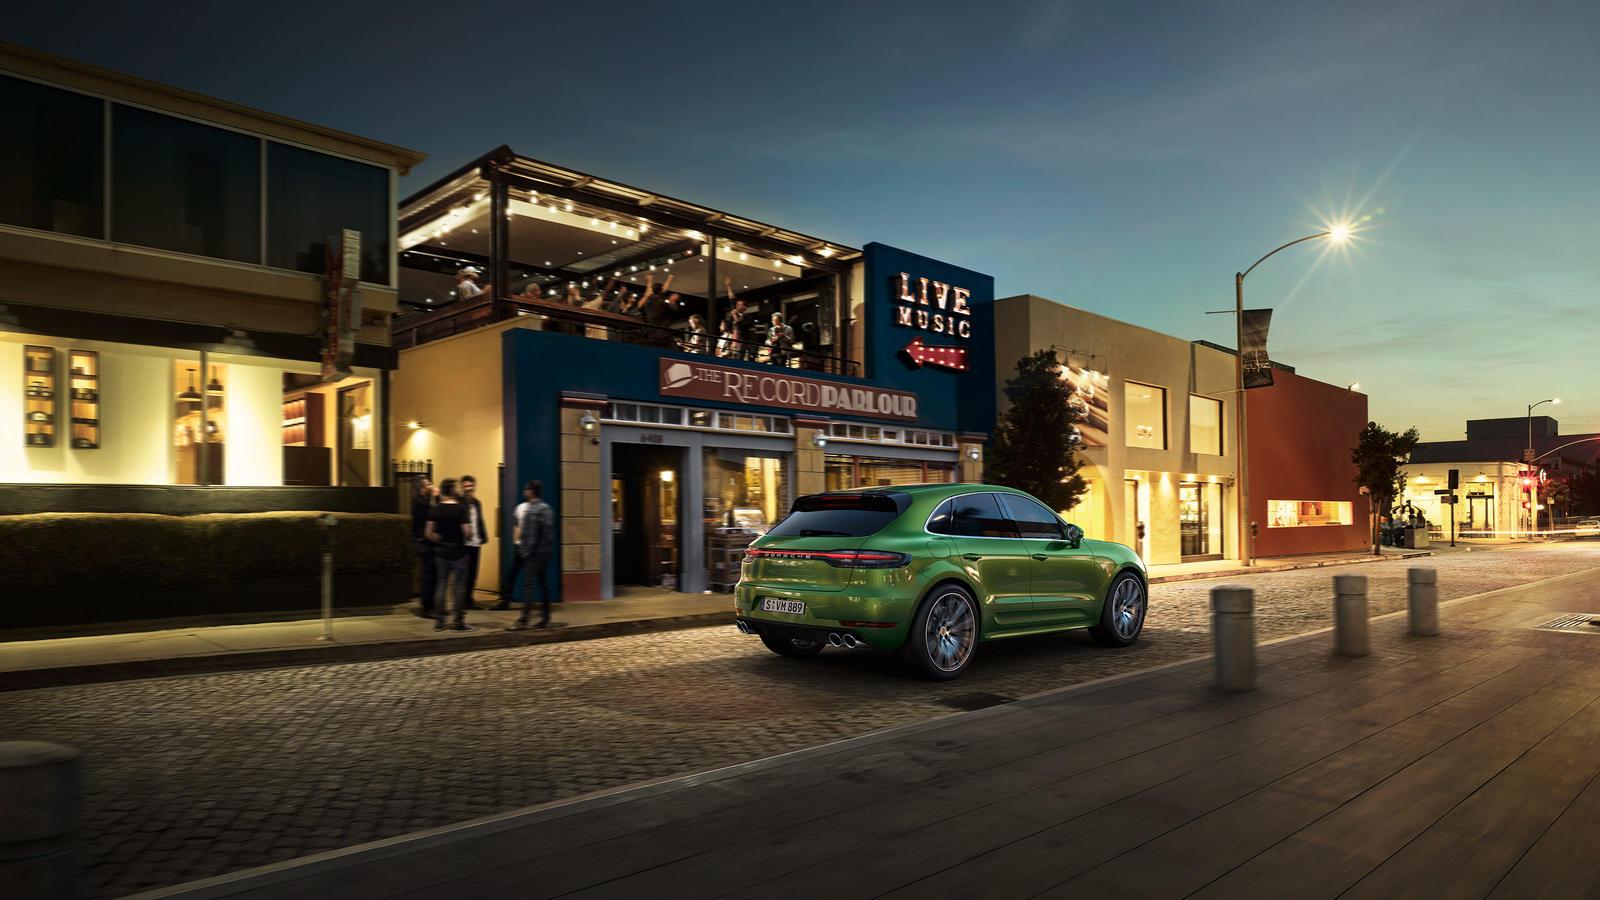 Porsche - Macan Turbo - Сильнее, быстрее, ярче.